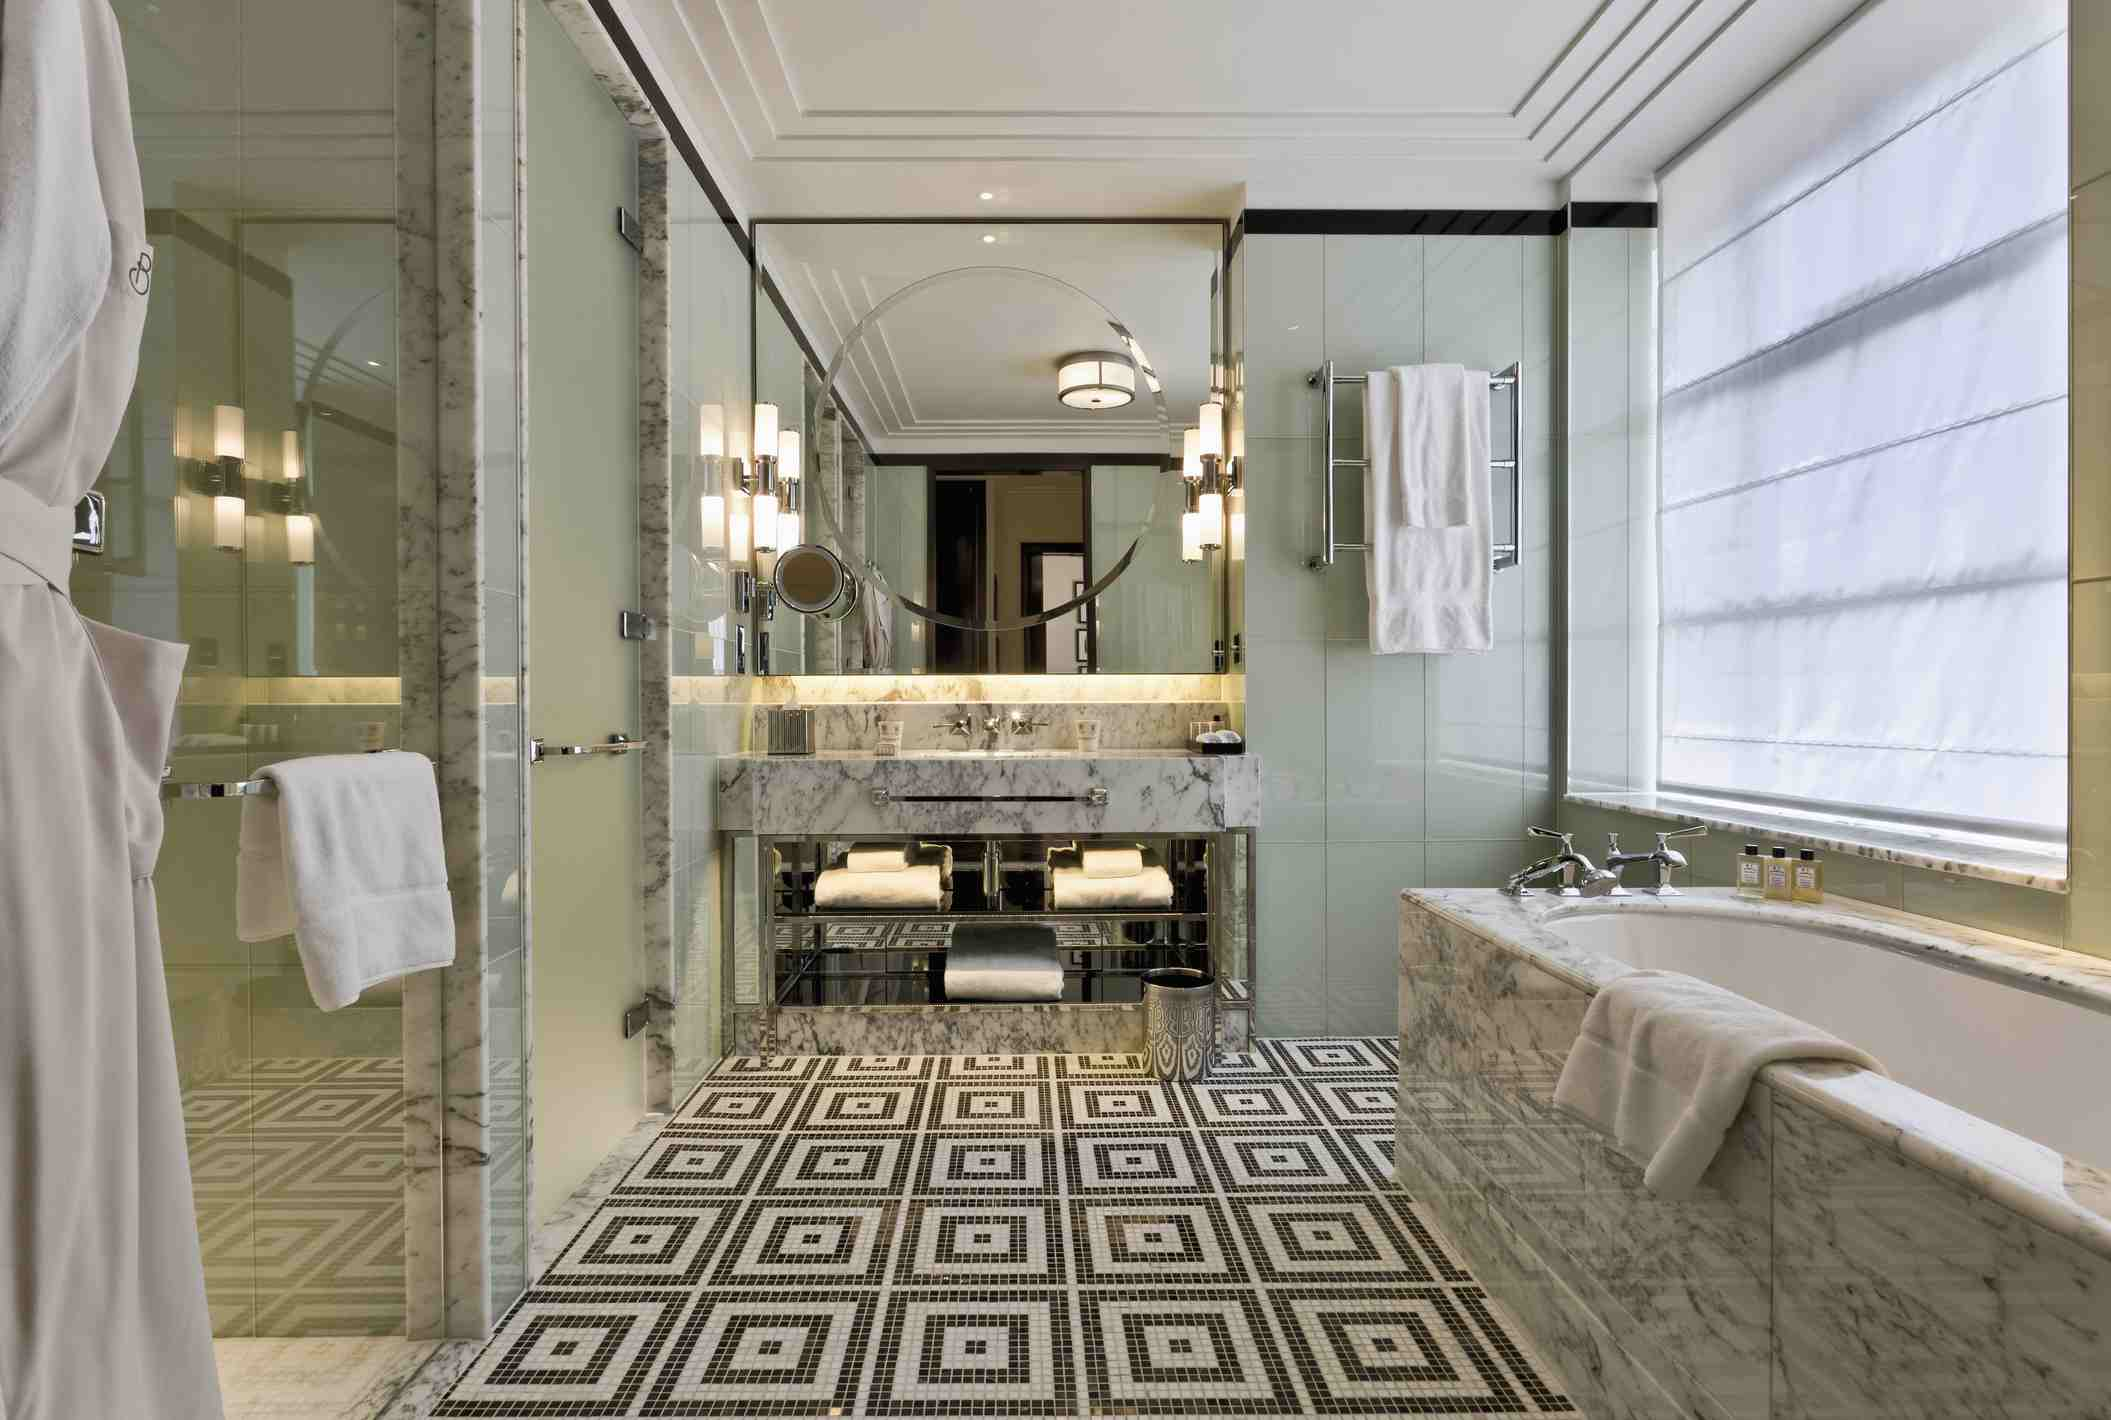 The Beaumont Hotel, London, United Kingdom. Architect: Reardon Smith Architects Limited